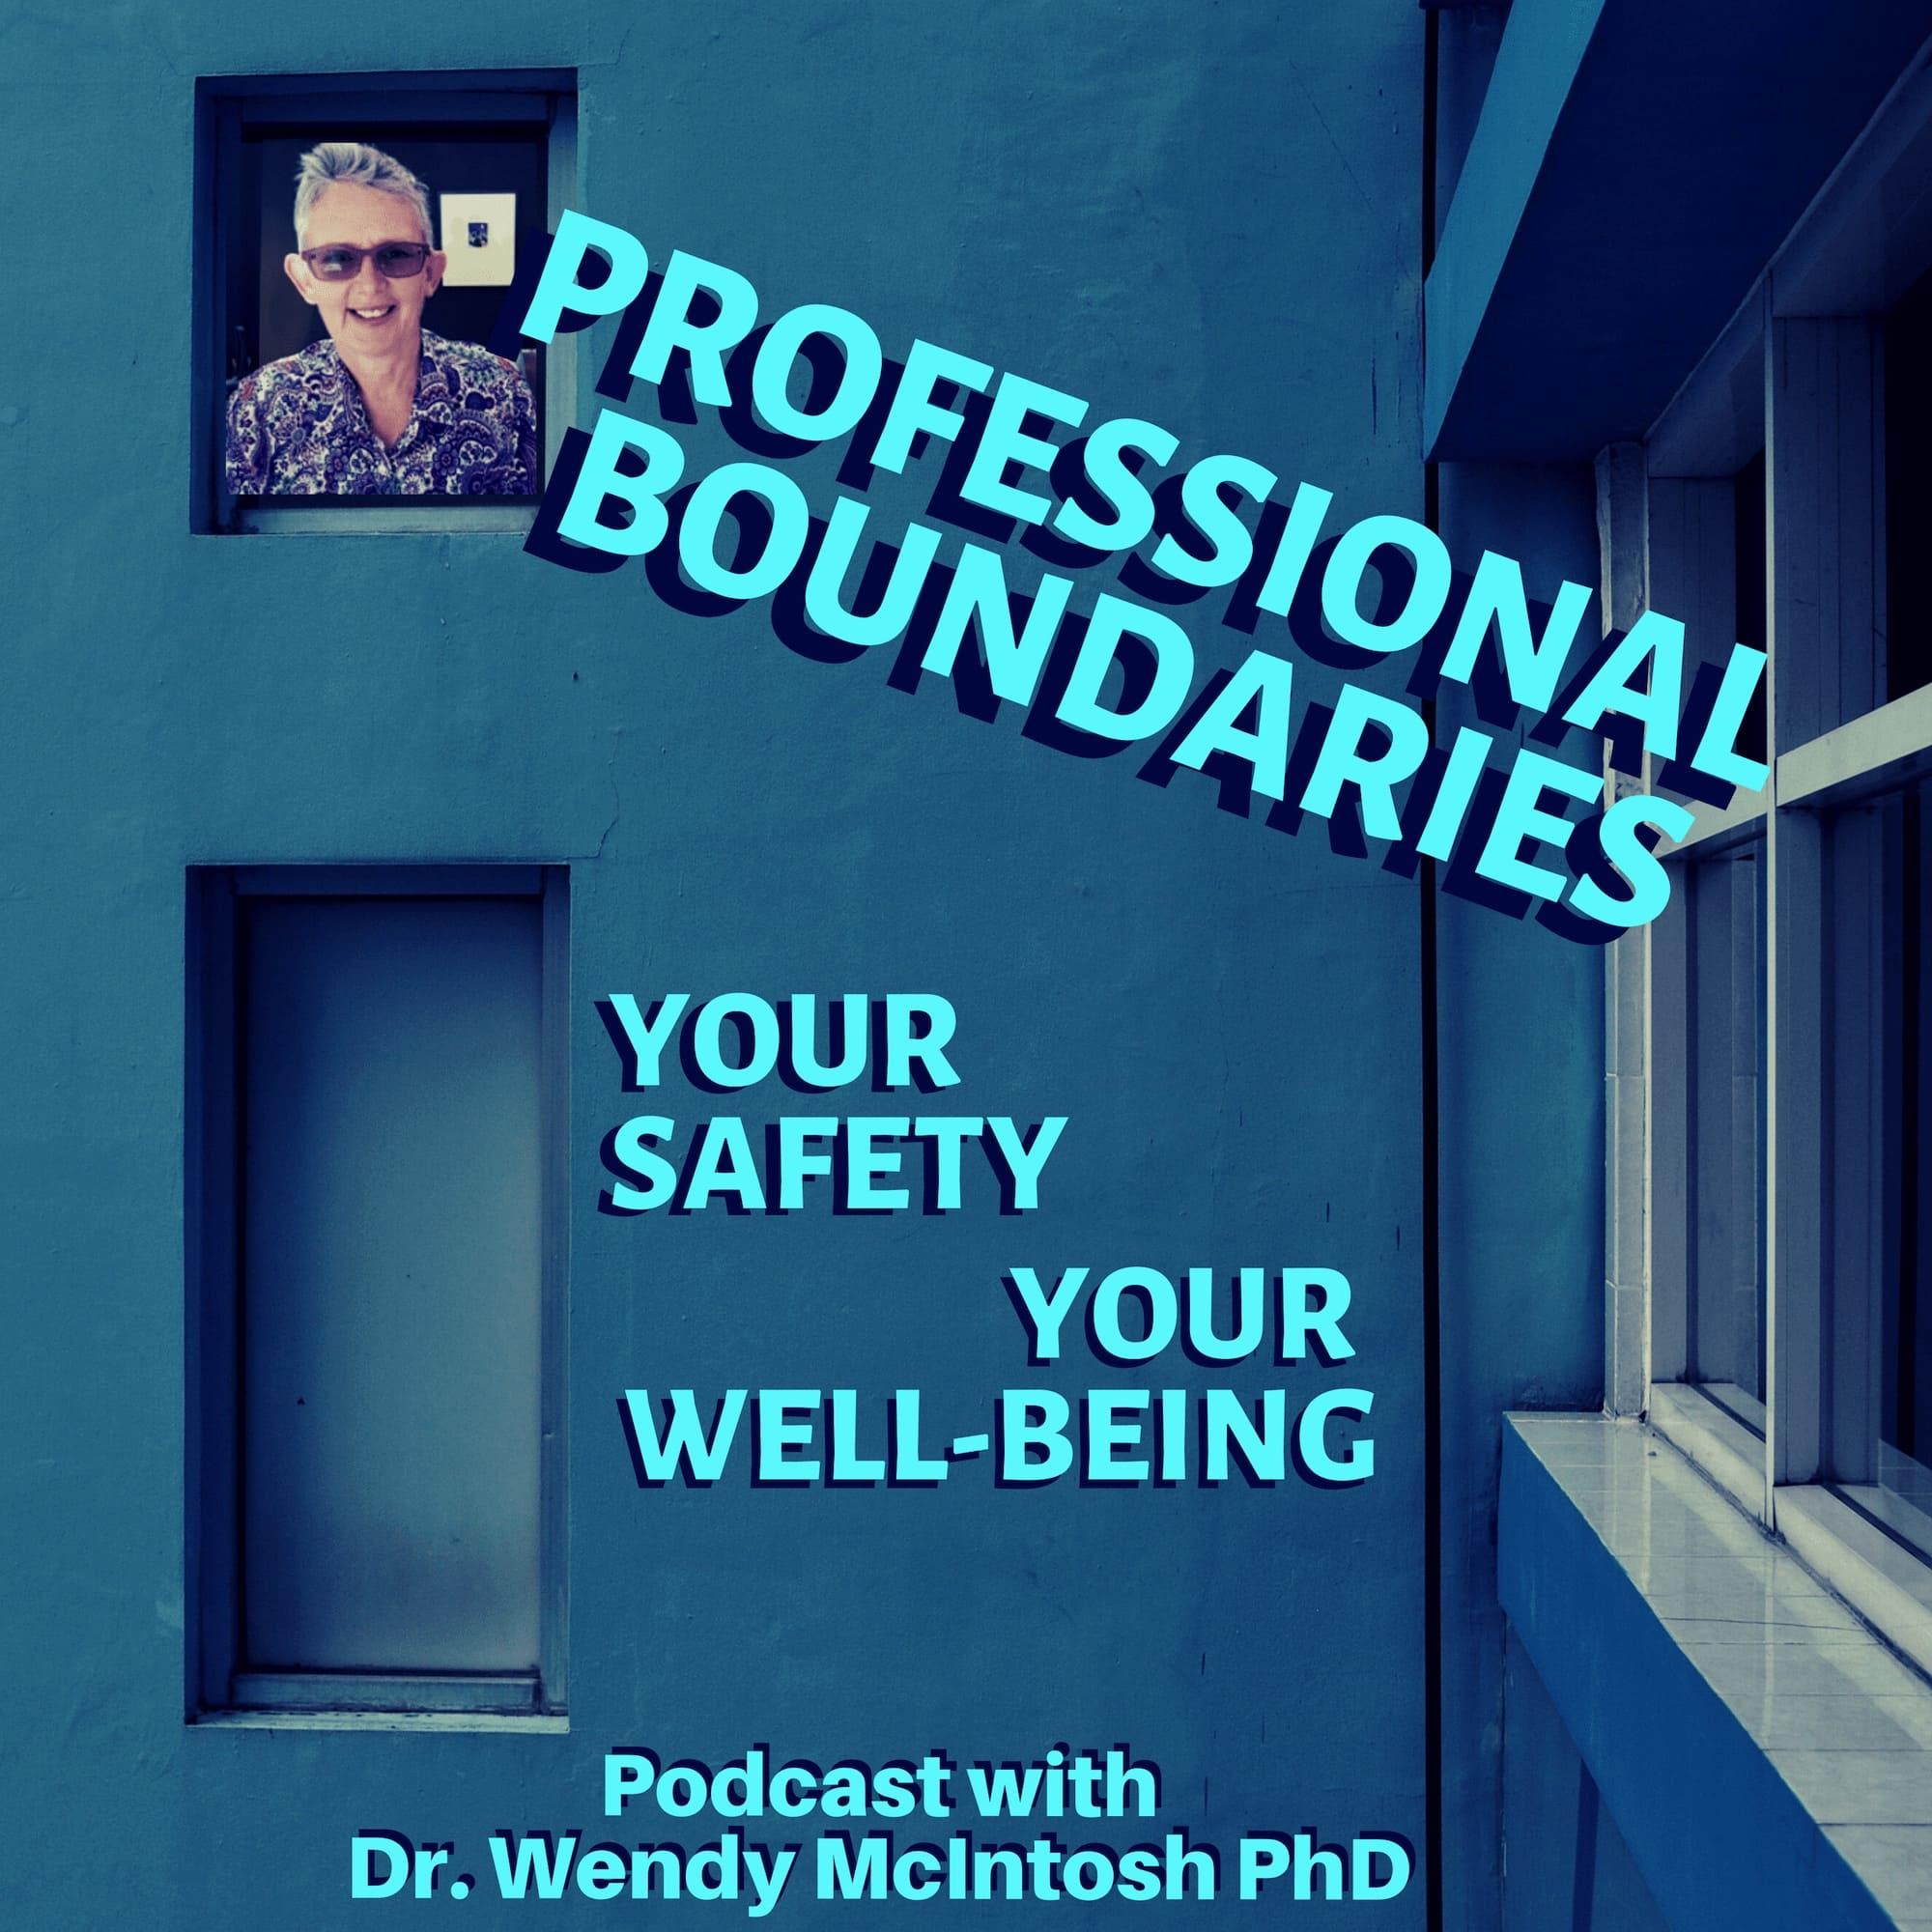 Professional Boundaries Podcast